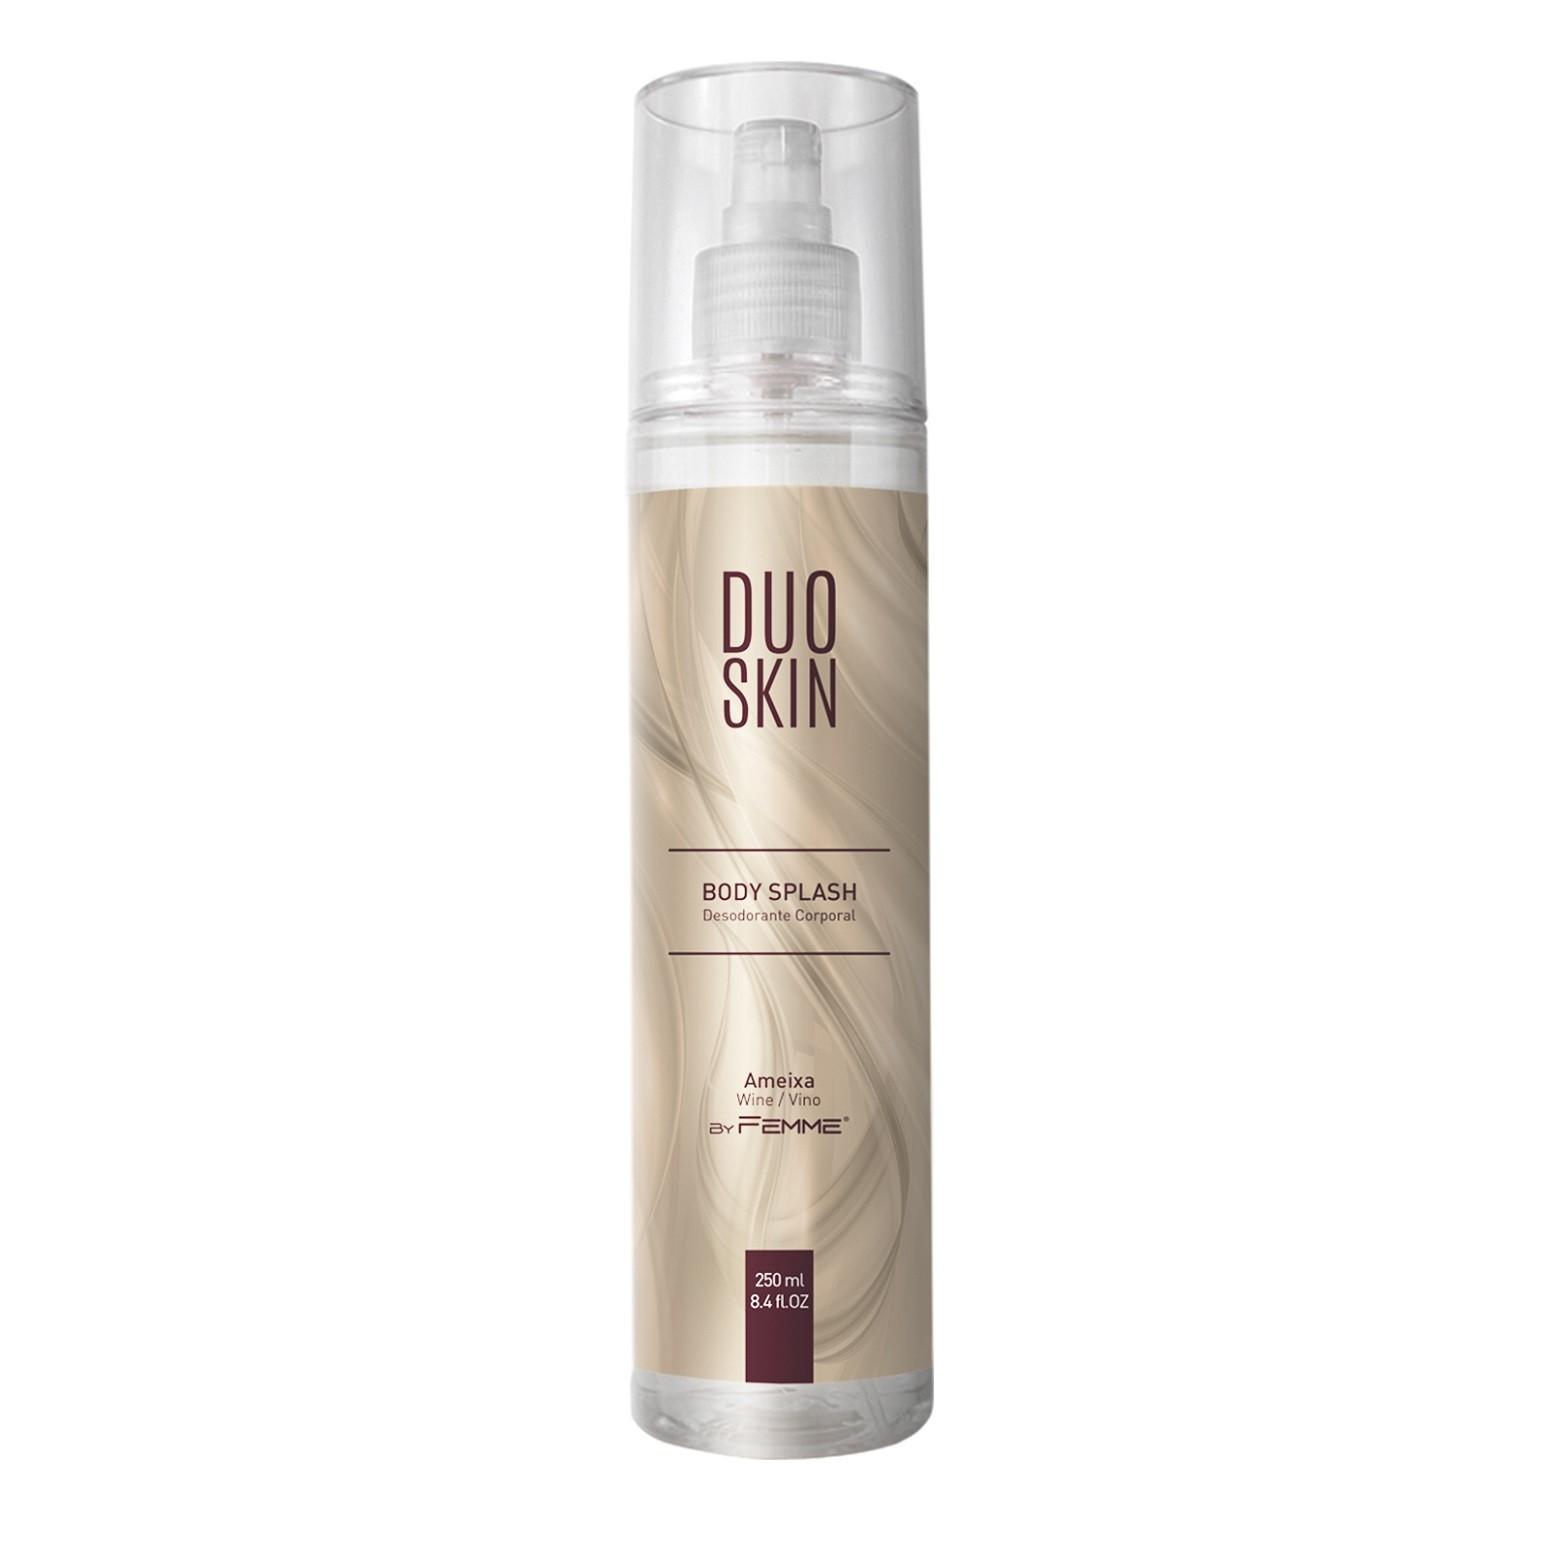 Body Splash Desodorante Corporal Duo Skin Ameixa 250ml